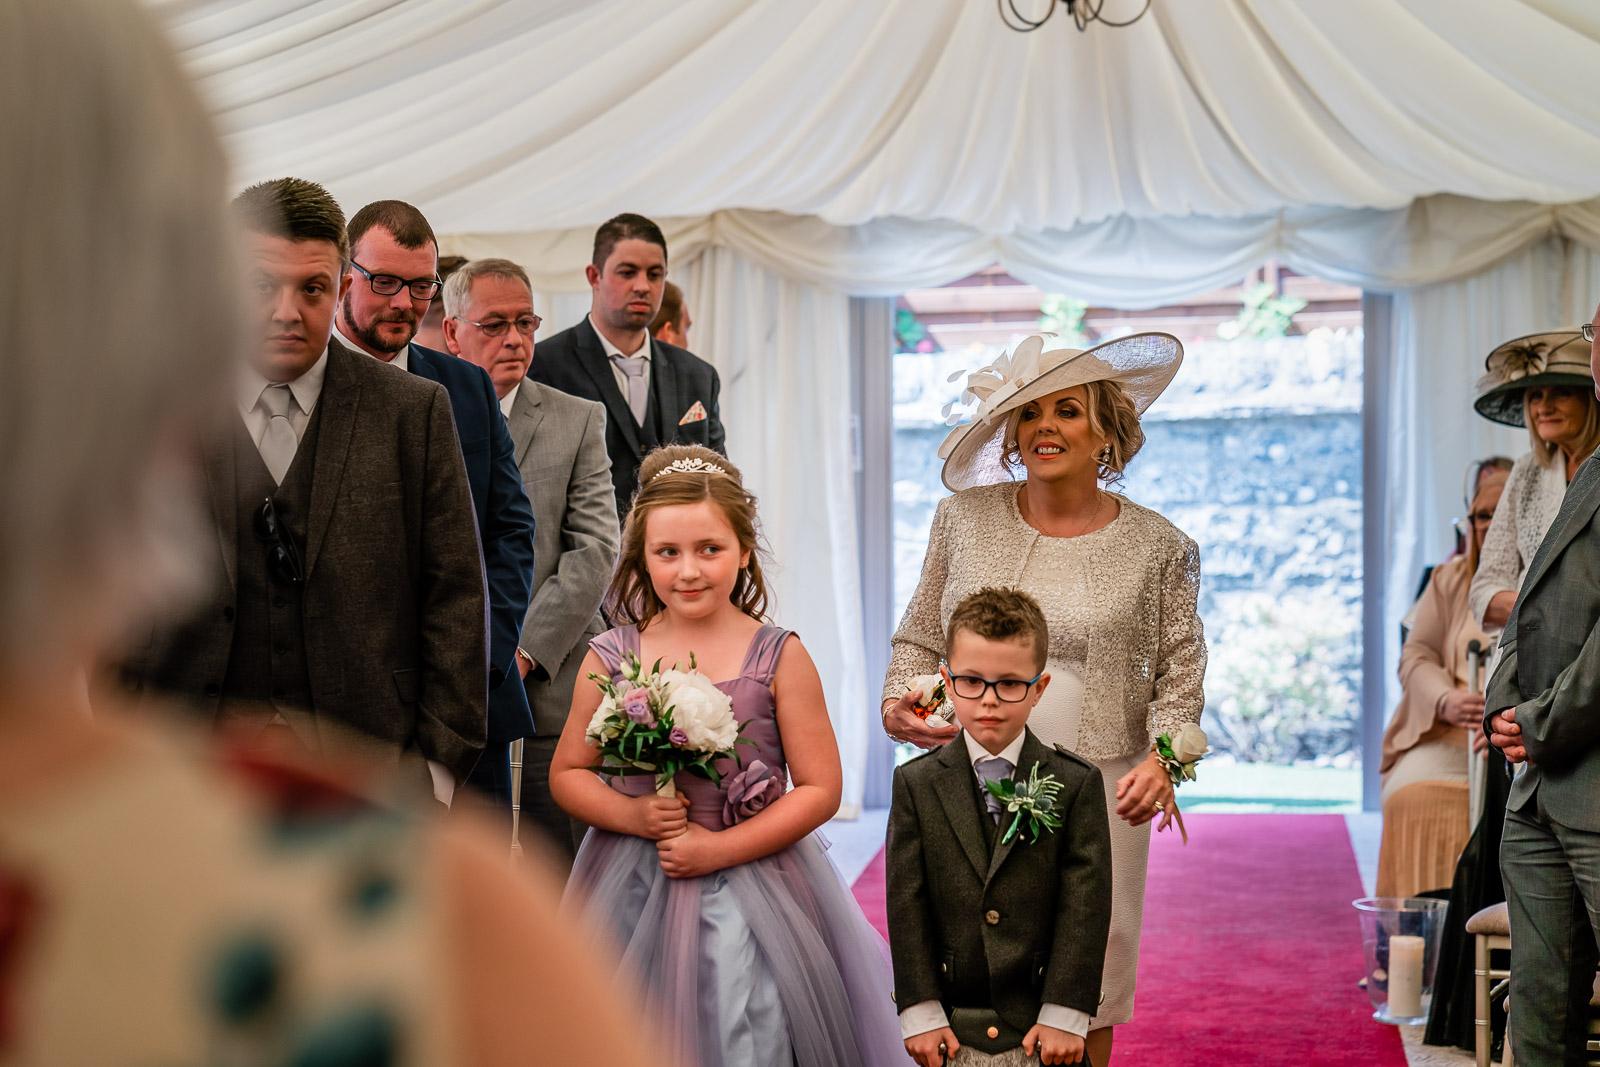 cornhill_castle_wedding_biggar_dearlyphotography (80 of 448).jpg